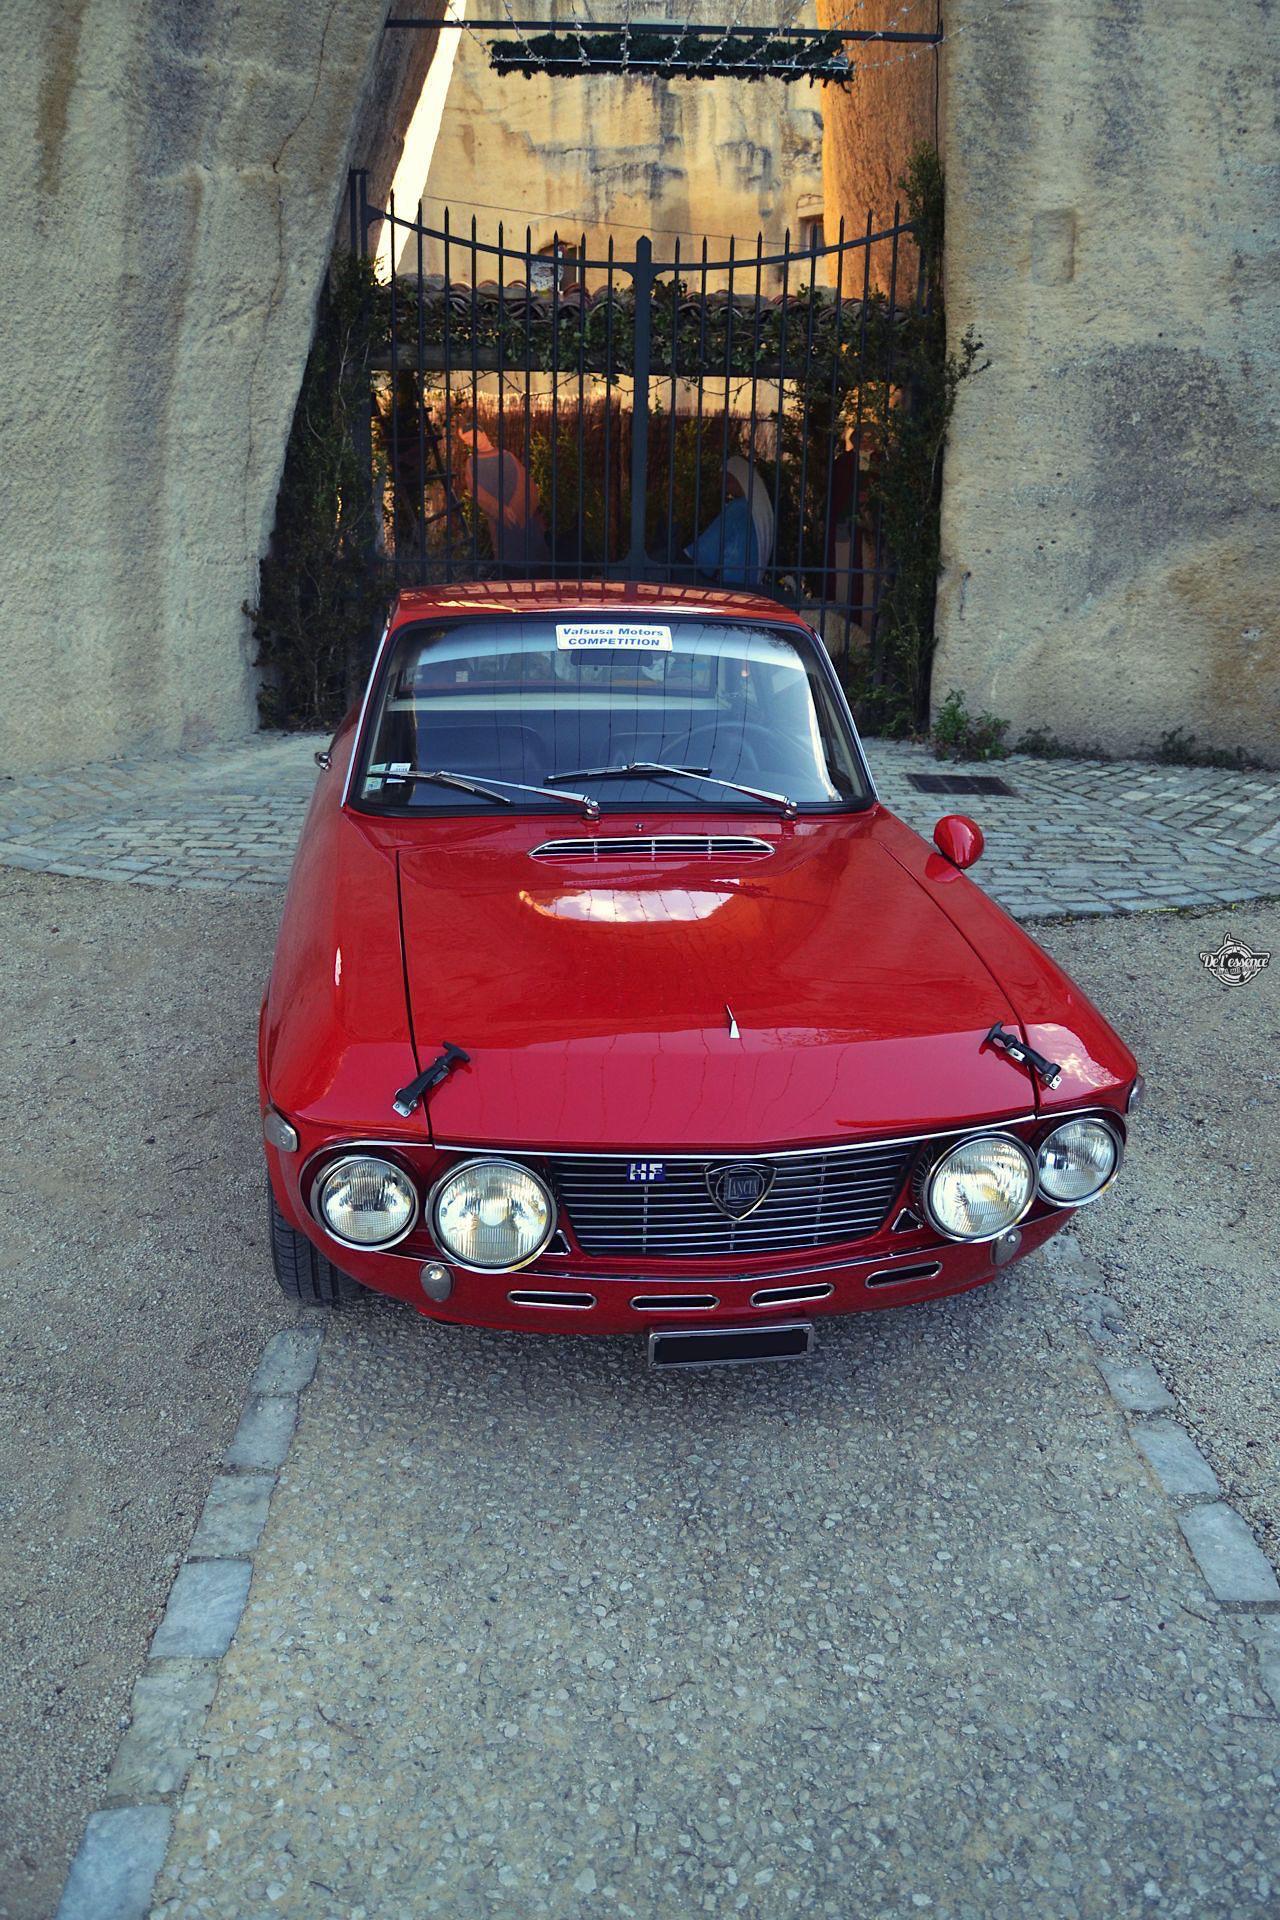 Lancia Fulvia HF Fanalone - Belissima leggenda ! 91